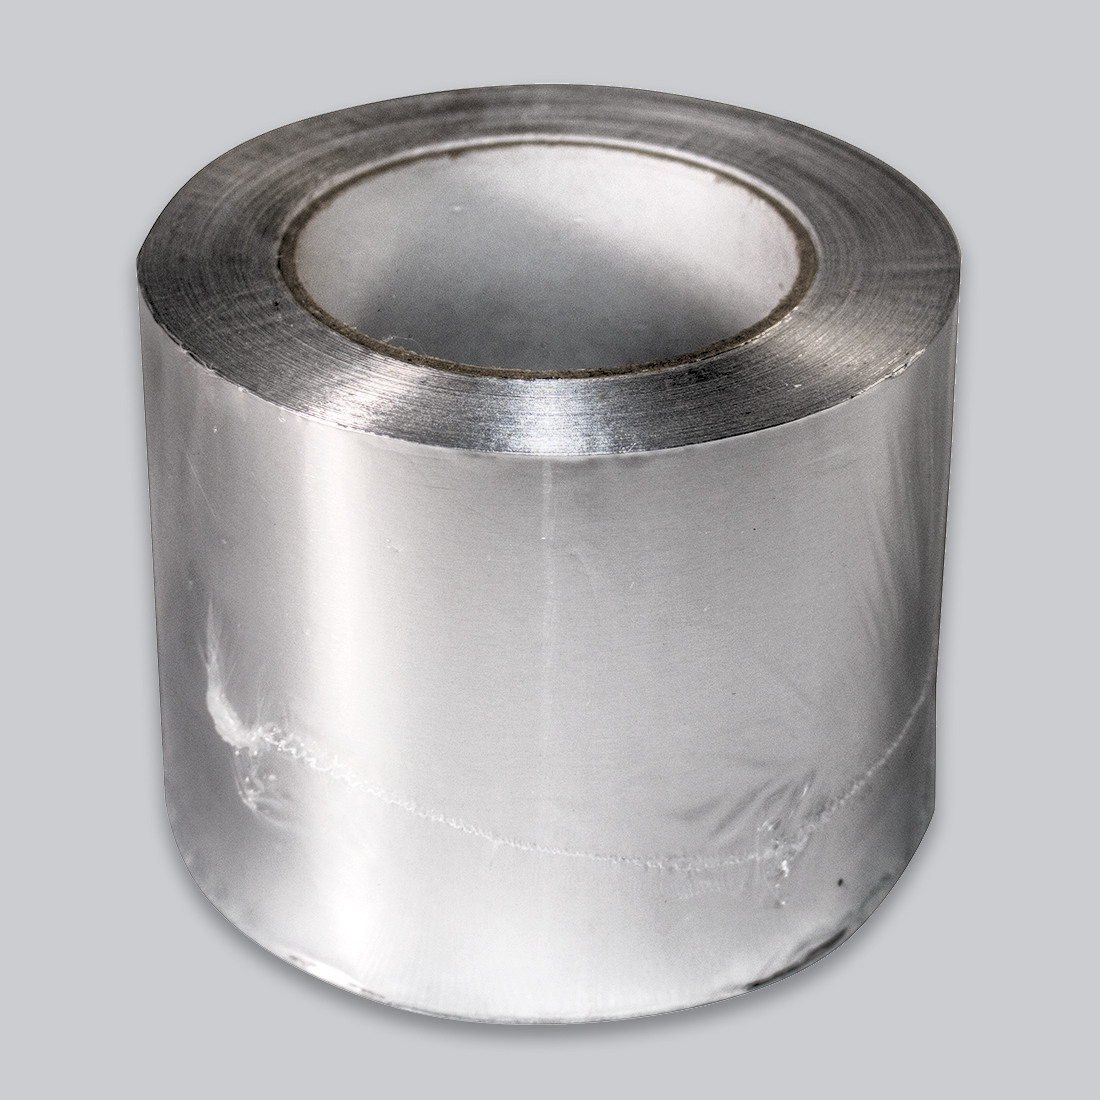 4434 alb alu klebeband hitzebest ndig bis 120 c 50 m rolle breite 100 mm aluminium. Black Bedroom Furniture Sets. Home Design Ideas